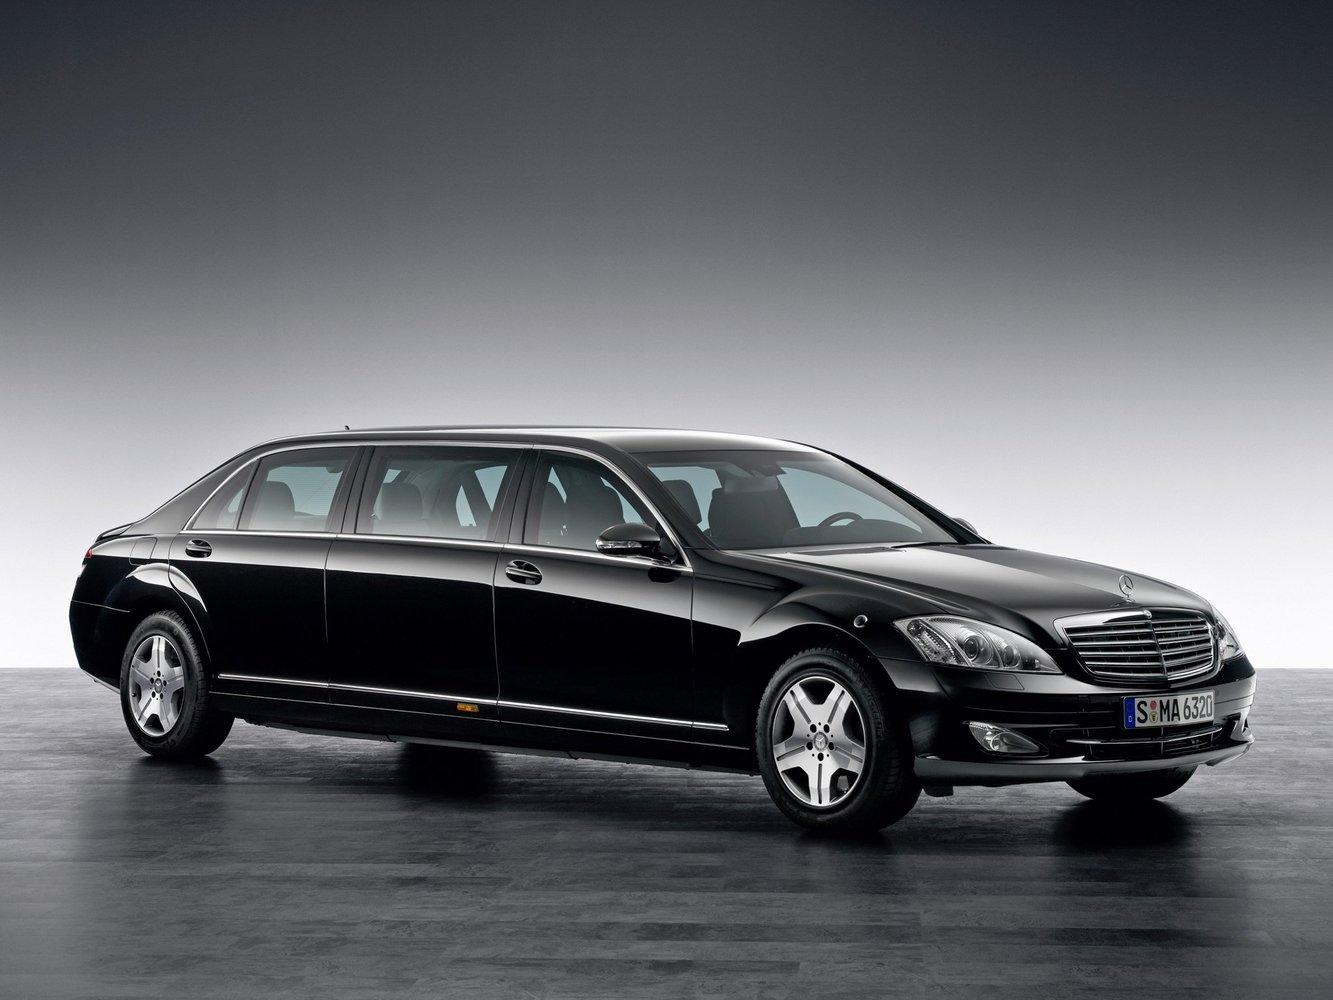 седан Pullman Mercedes-Benz S-klasse